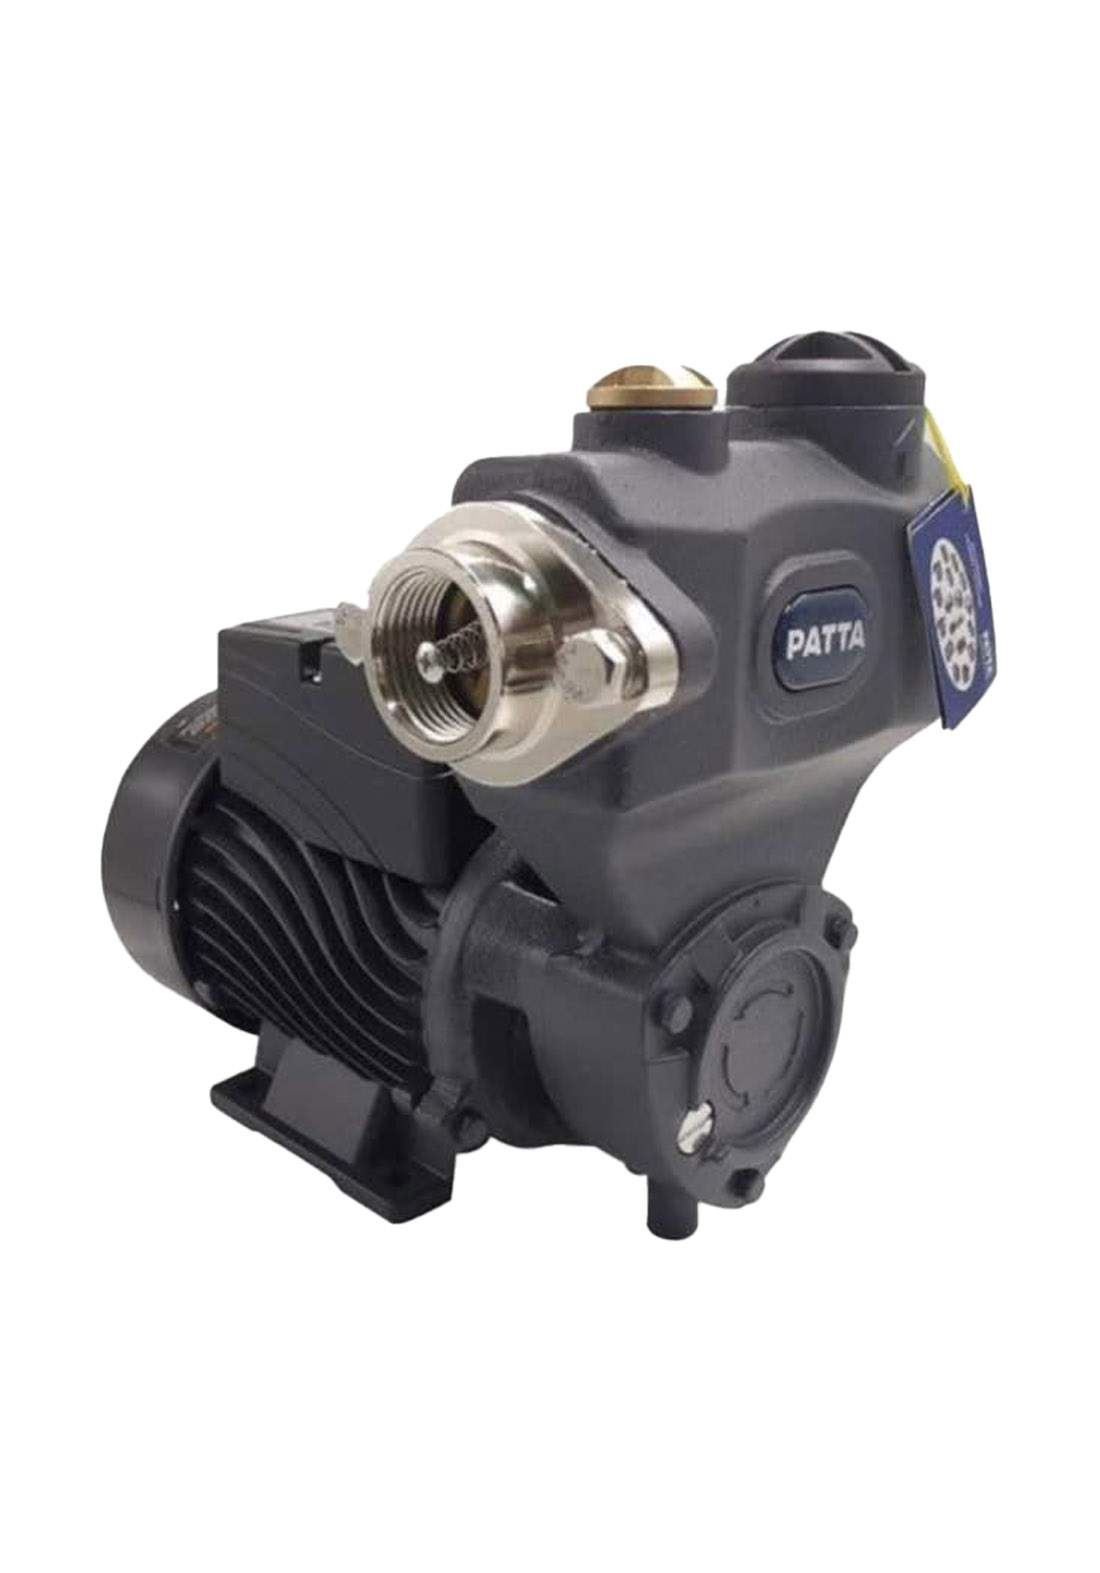 Patta PATWZB-65 Domestic Water Pump  1100 W ماطور مياه